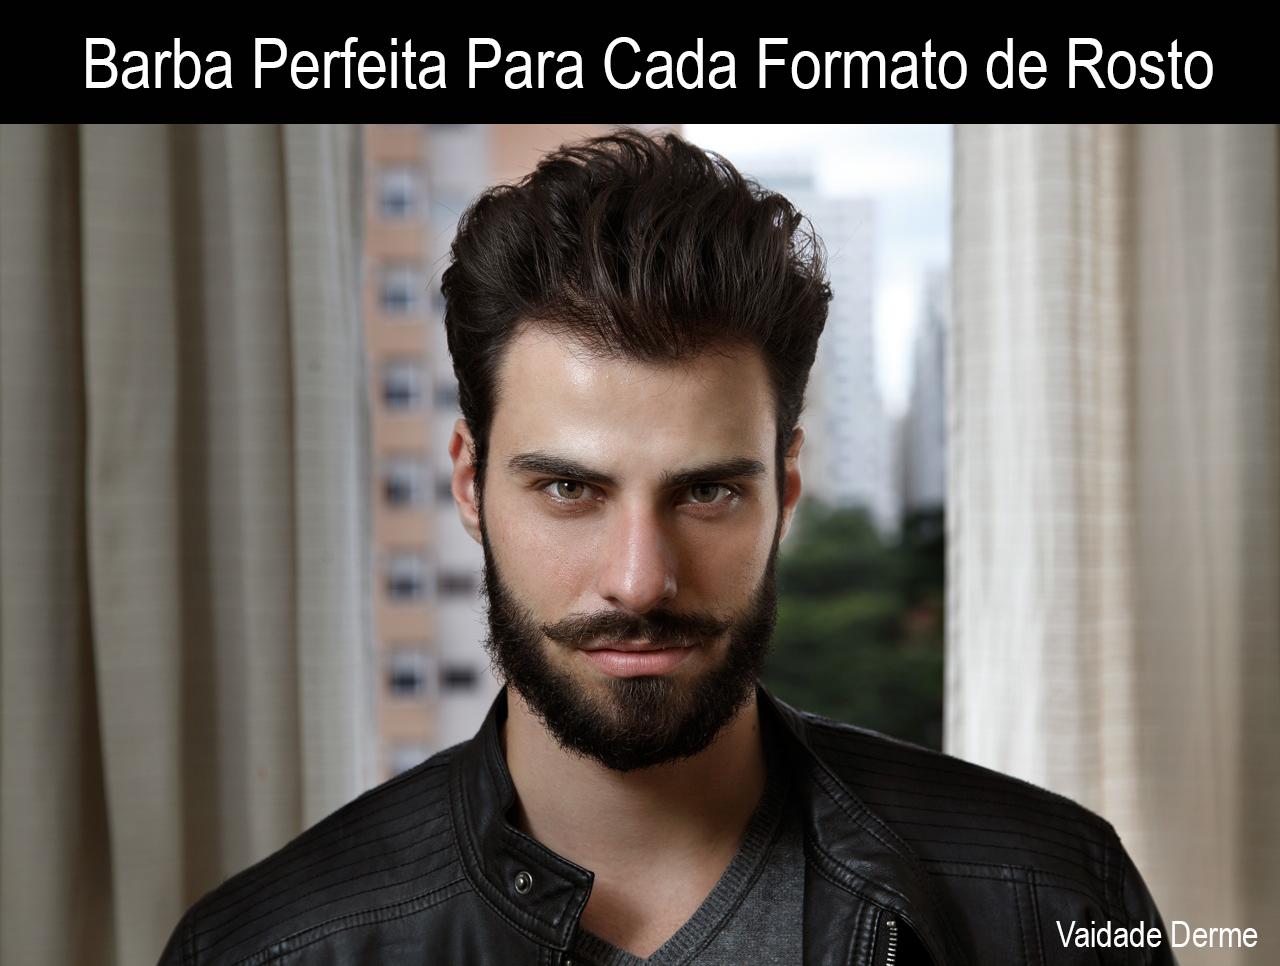 Barba Perfeita Para Cada Formato de Rosto